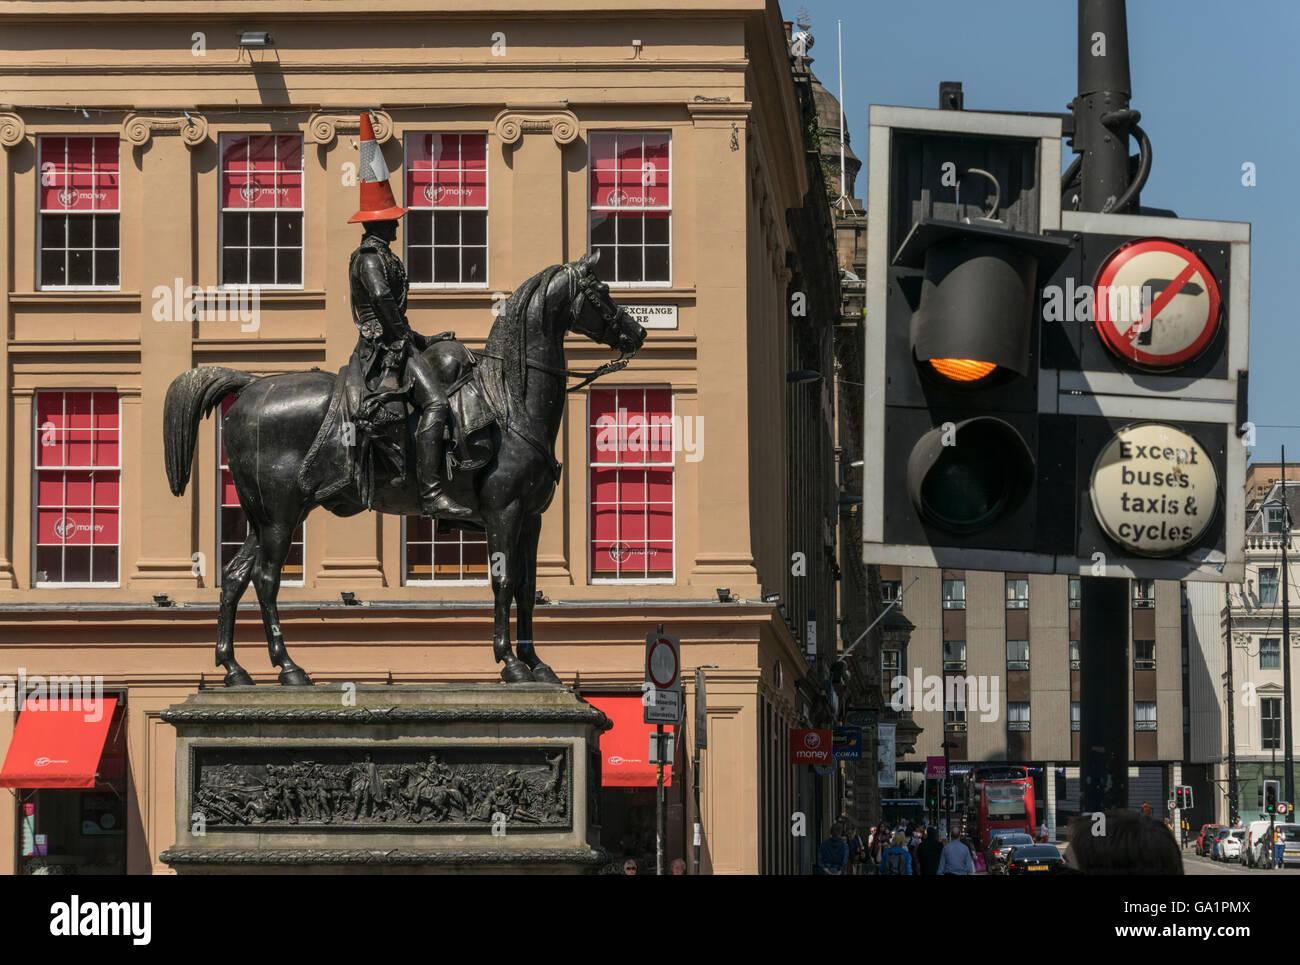 Statue of Duke of Wellington with traffic cone on head, Royal Exchange Square, Glasgow, Scotland, UK, - Stock Image